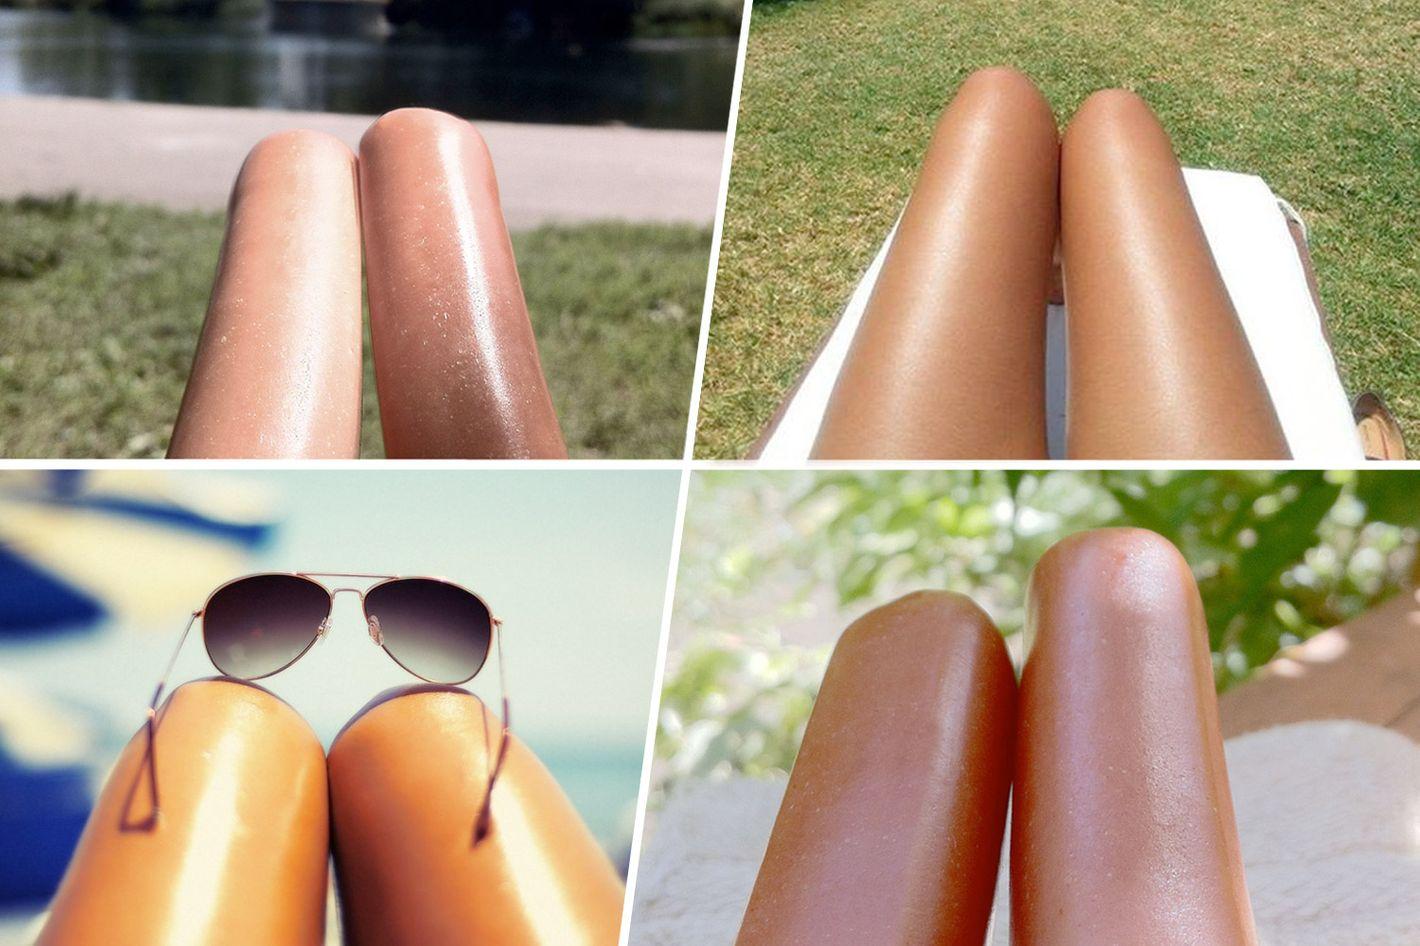 legs or wieners